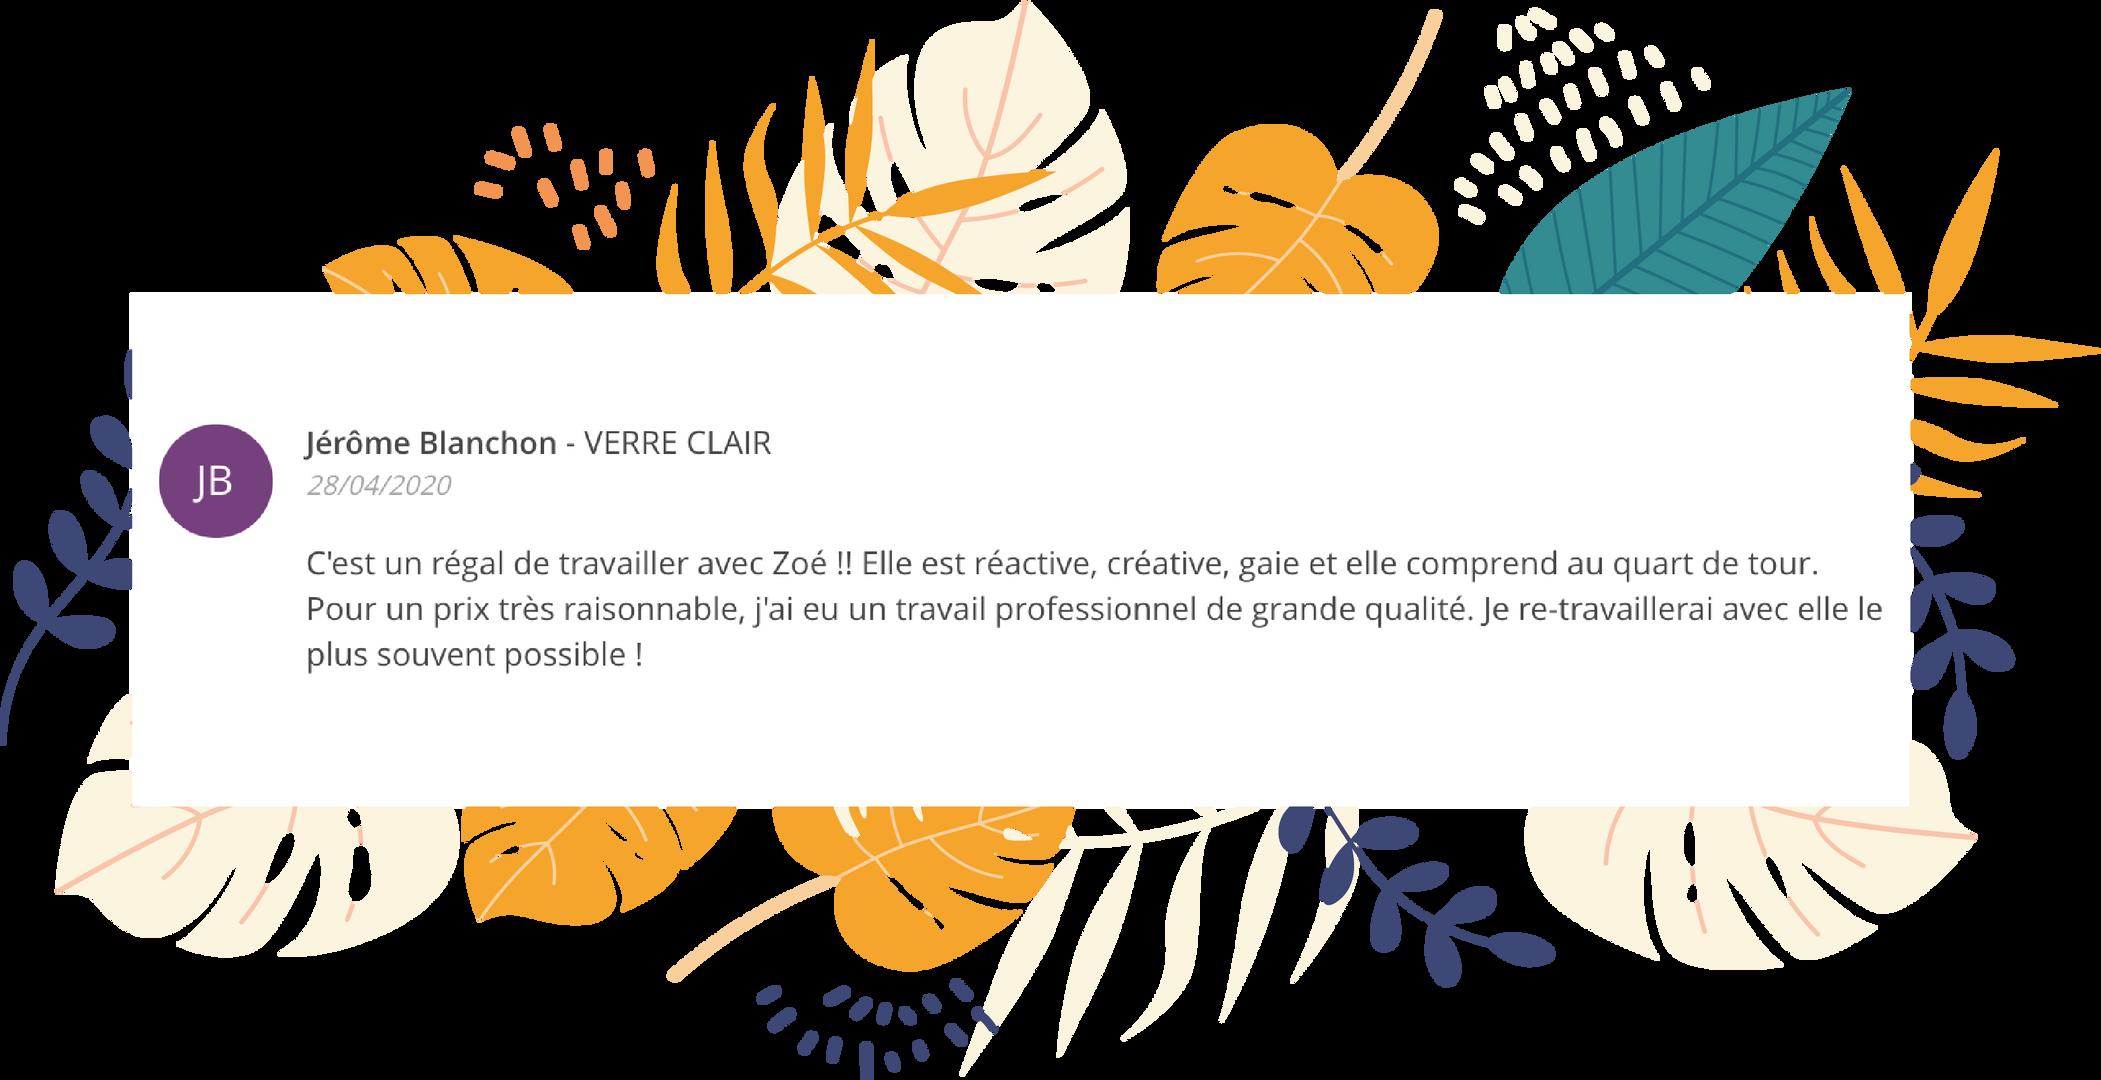 AVIS JEROME - VERRE CLAIR